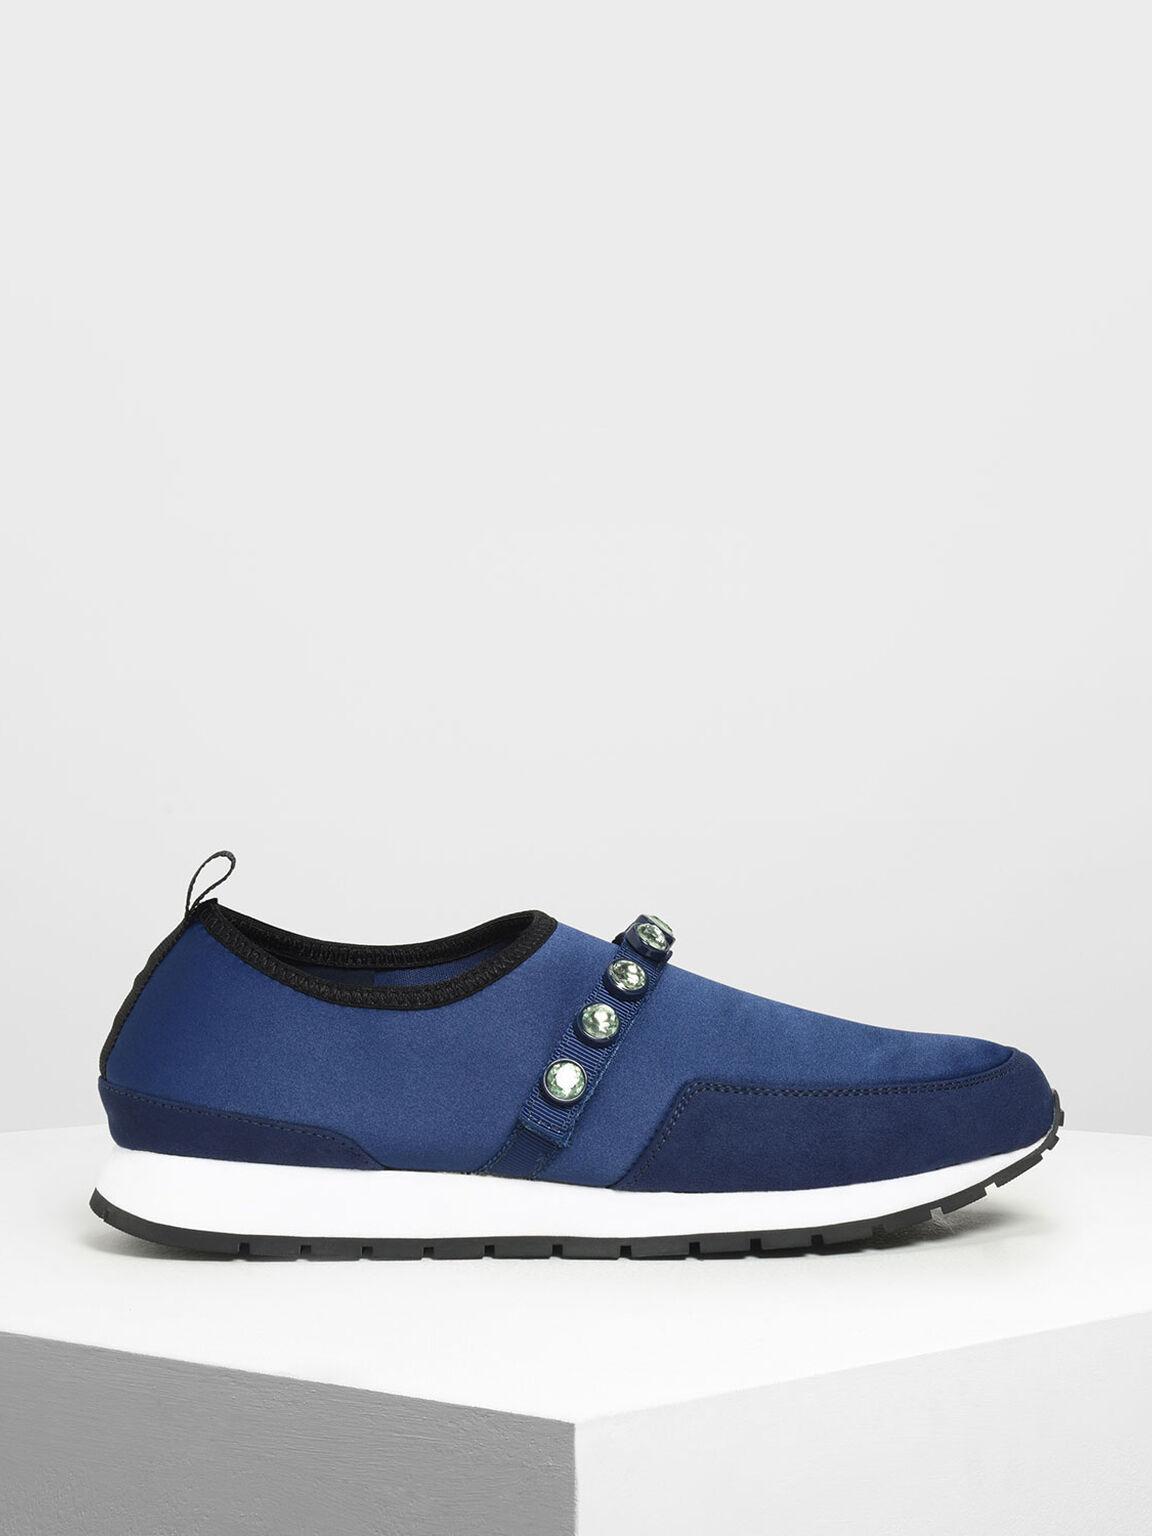 Embellished Slip-On Sneakers, Dark Blue, hi-res